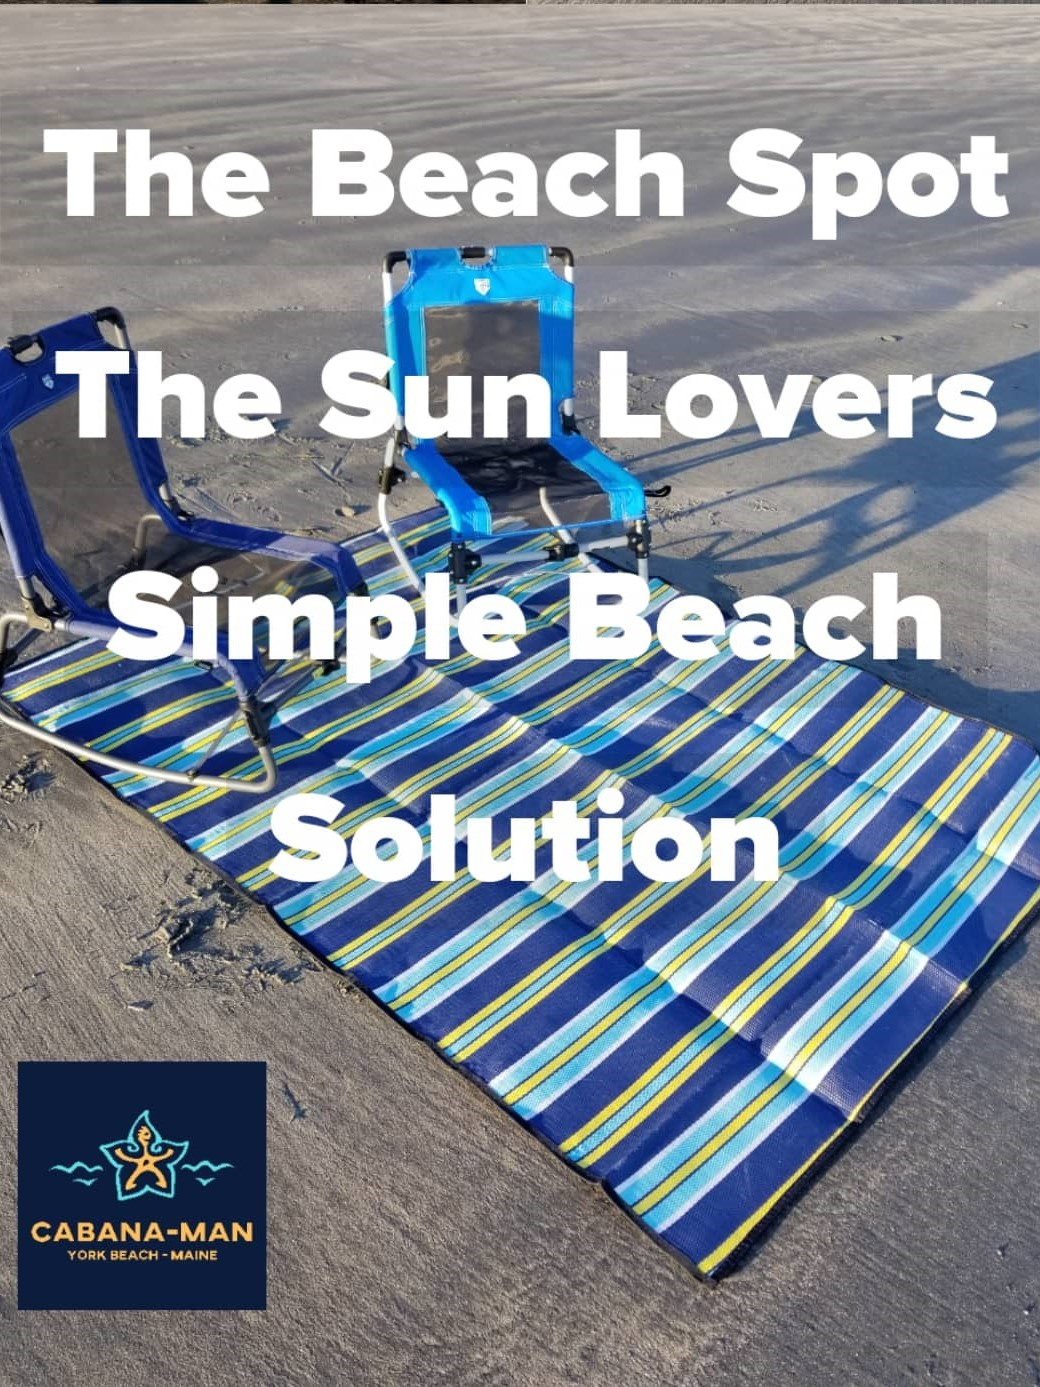 The Beach Spot